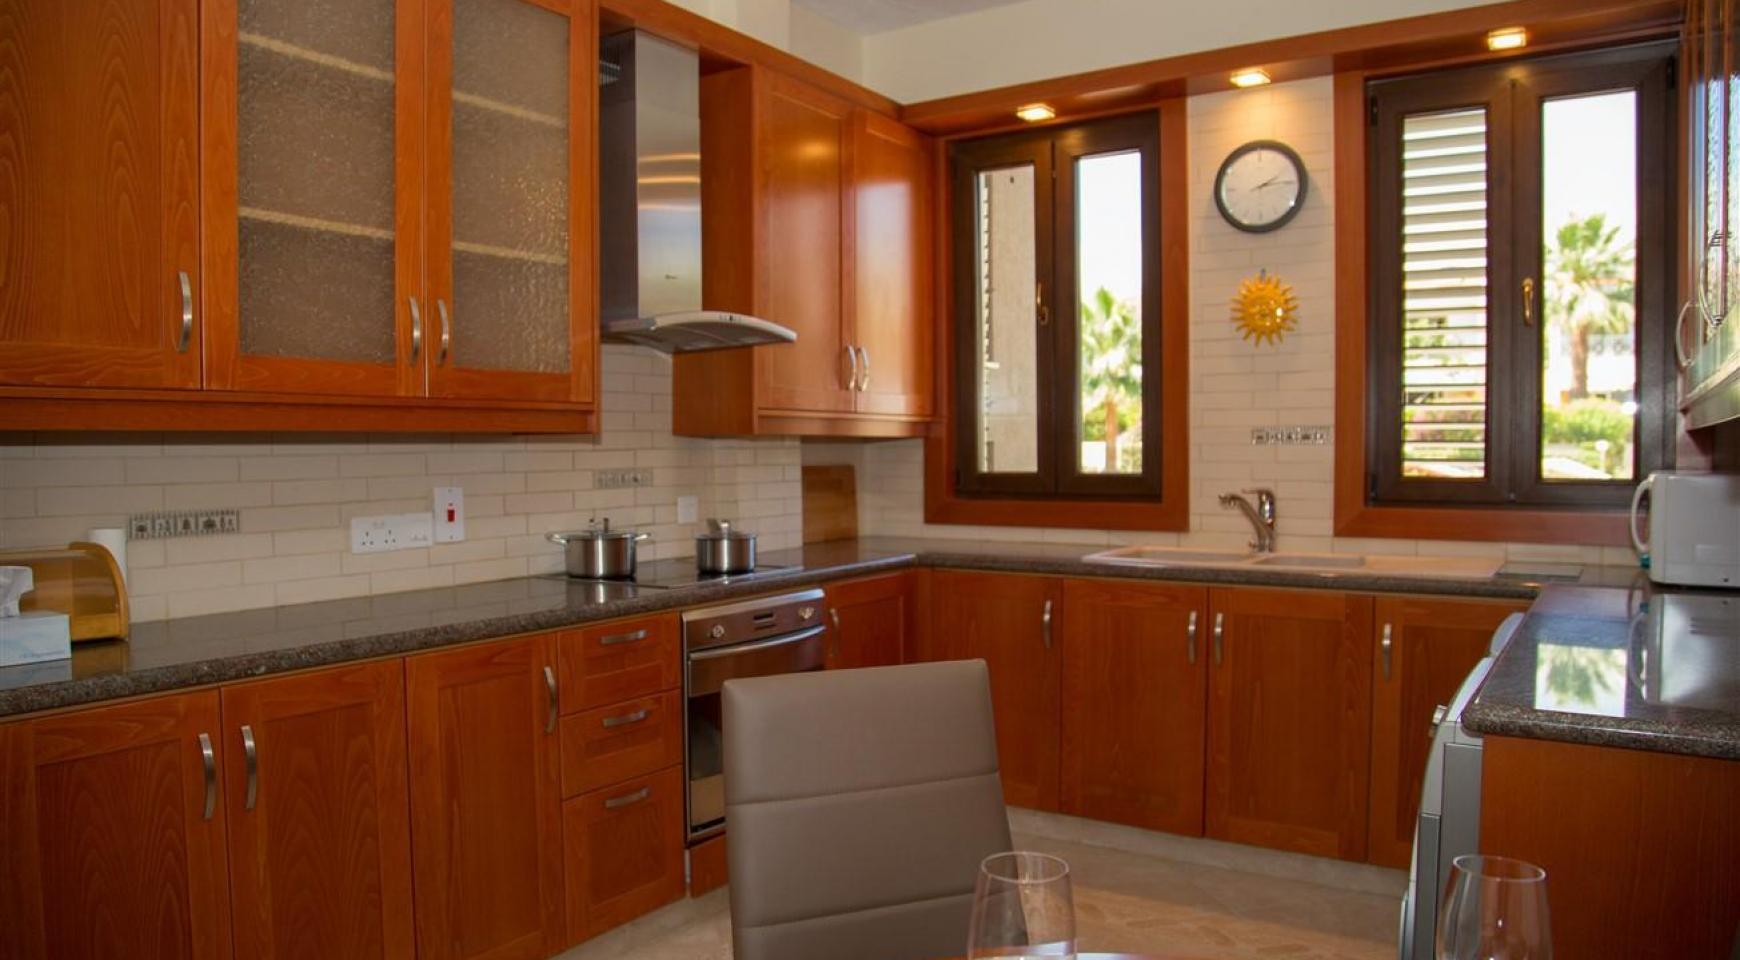 3-Спальная Квартира на Берегу Моря в Комплексе Thera   - 23